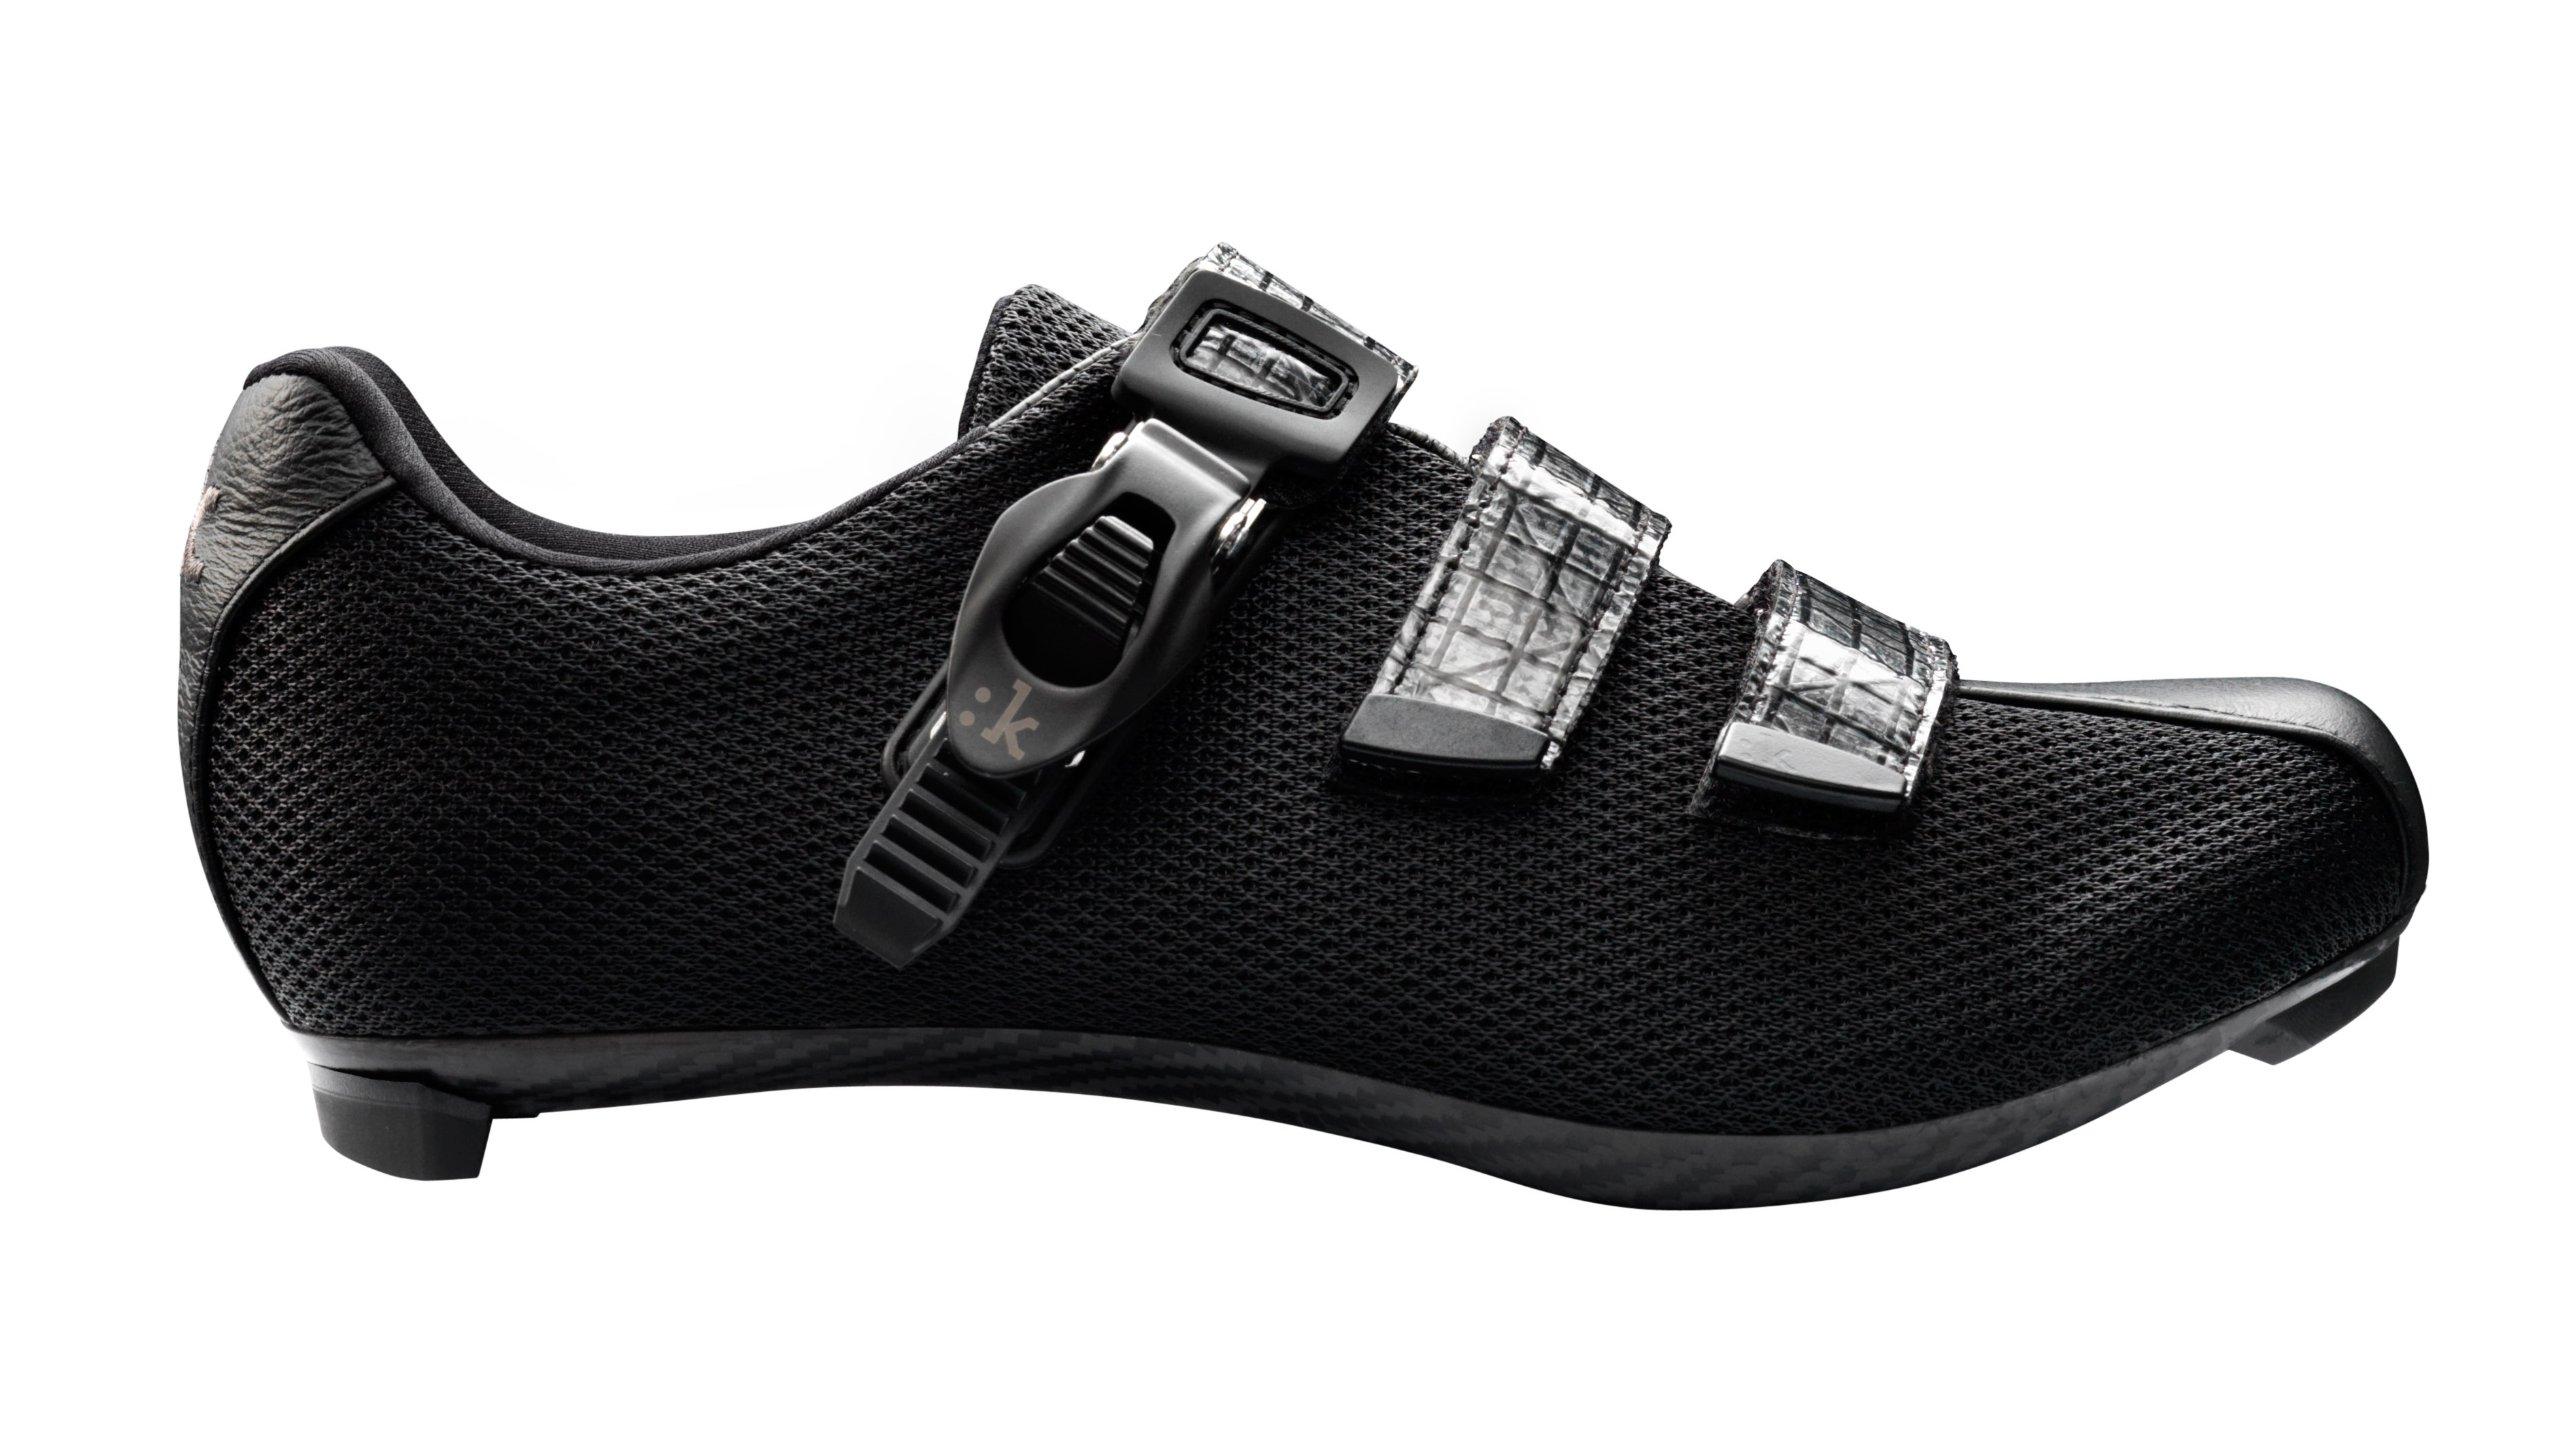 Fizik Women's R3 Donna Road Cycling Shoes, Black, Size 41.5